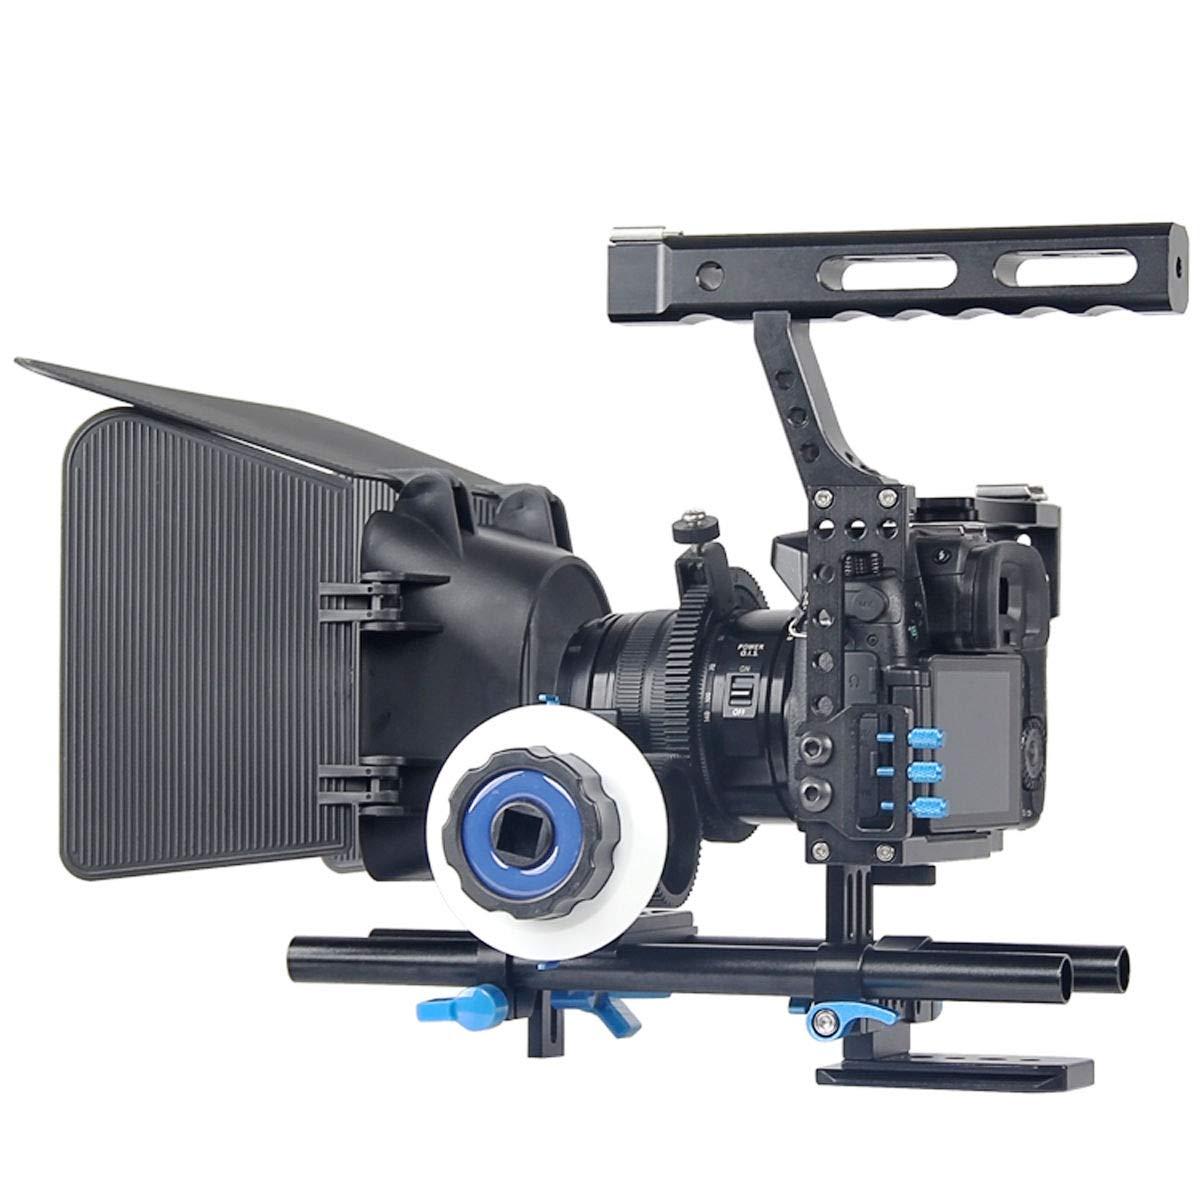 FidgetFidget Stabilizers for DSLR Camera Cage + Follow Focus + Matte Box Kit for Sony A7S A7 A7R A7RII A7SII by FidgetFidget (Image #1)